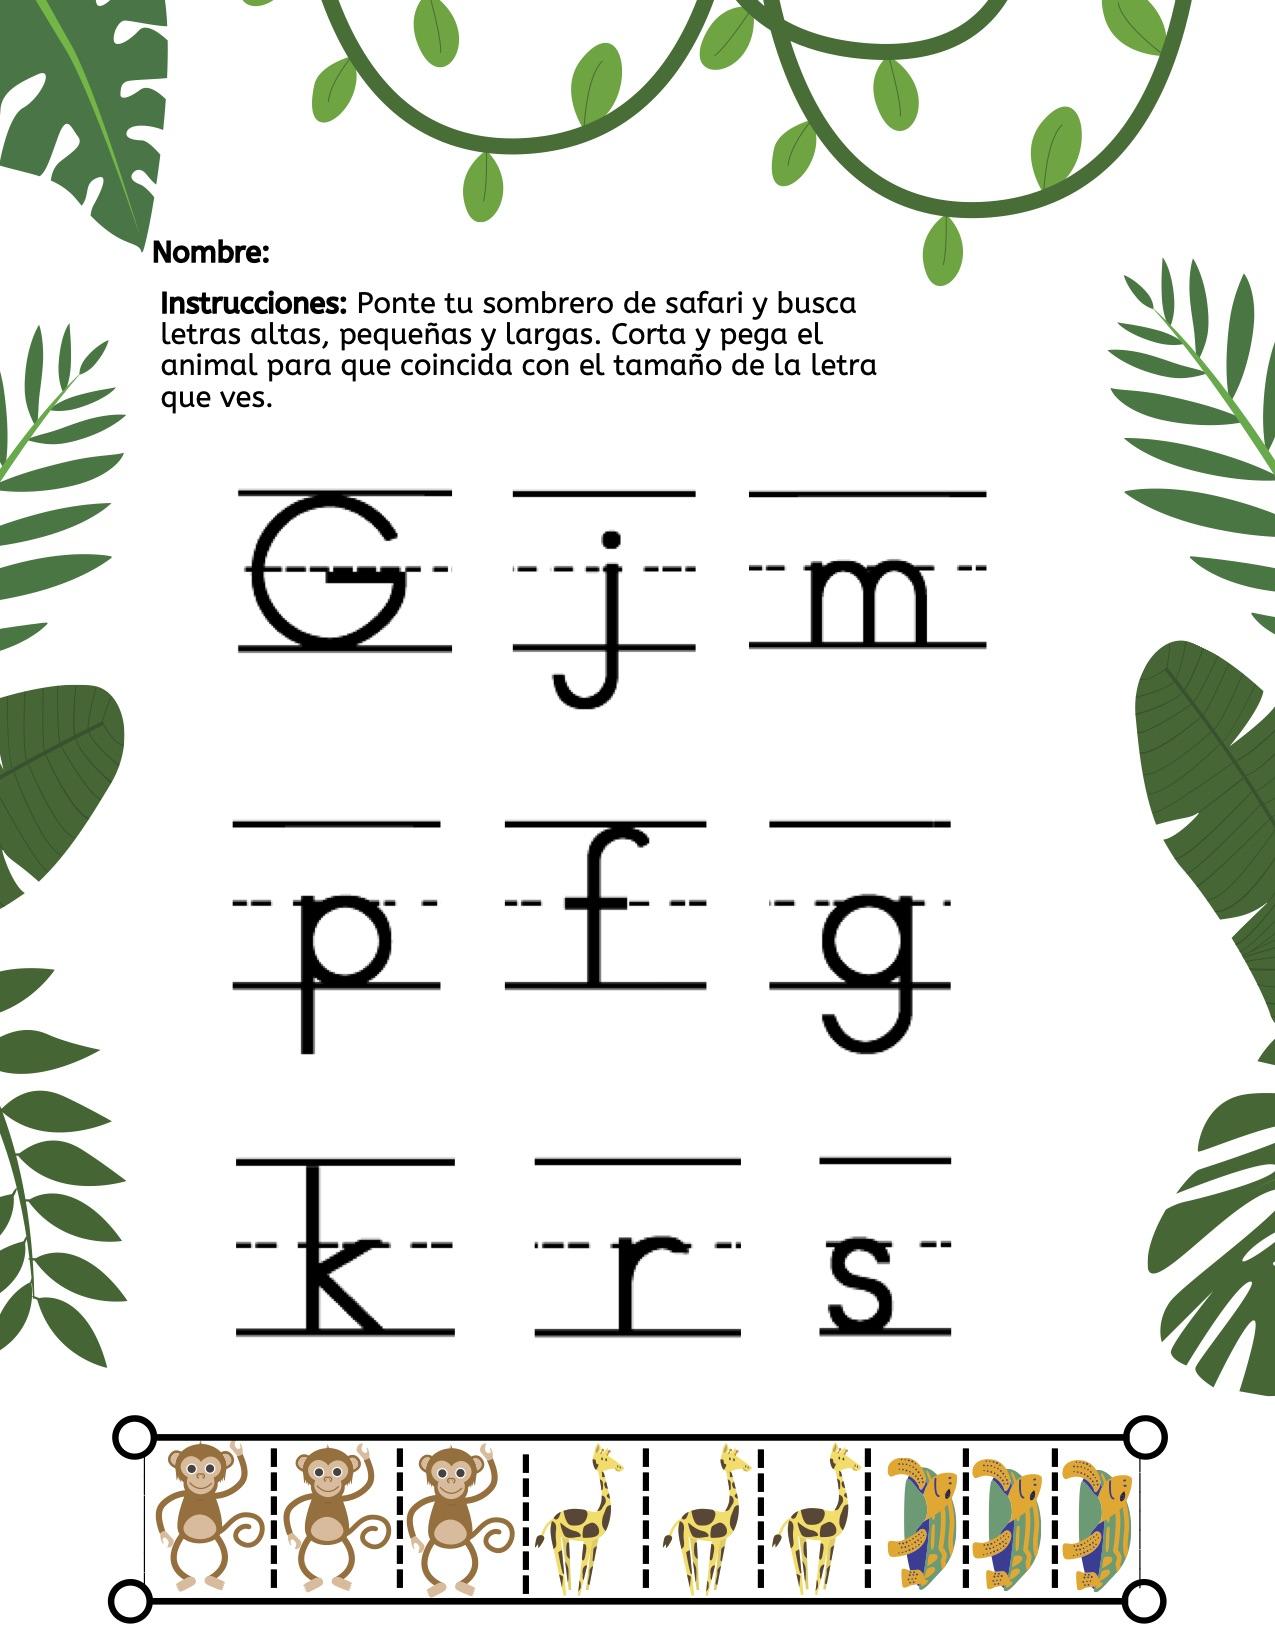 Spanish Cut Amp Paste Safari Letter Size Worksheet Kyu R